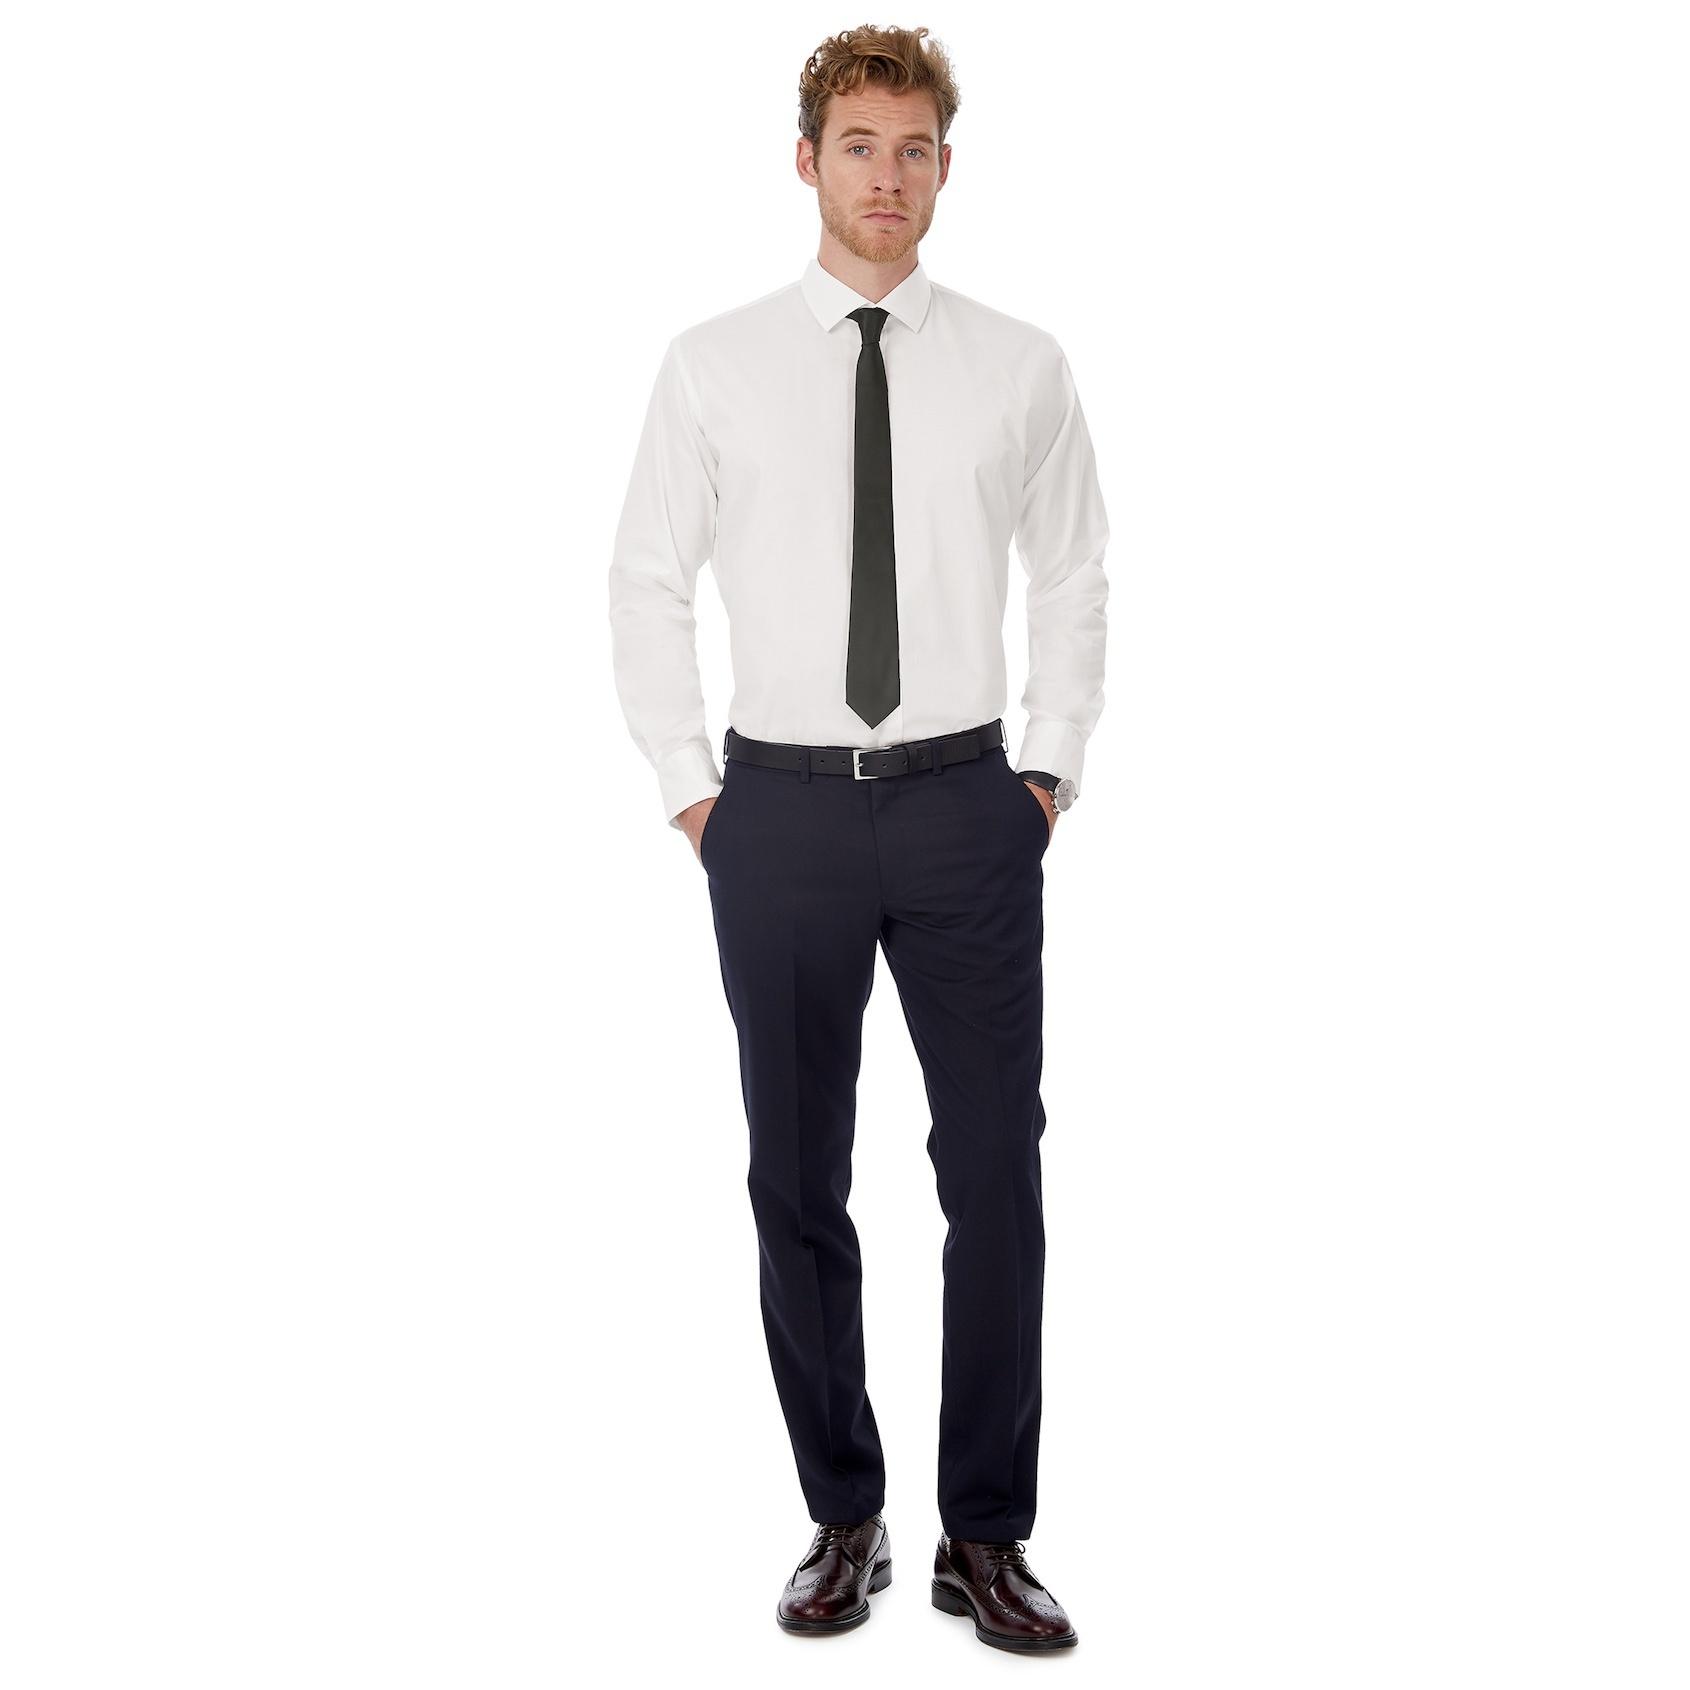 B C Black Tie Lsl Men B C Collection